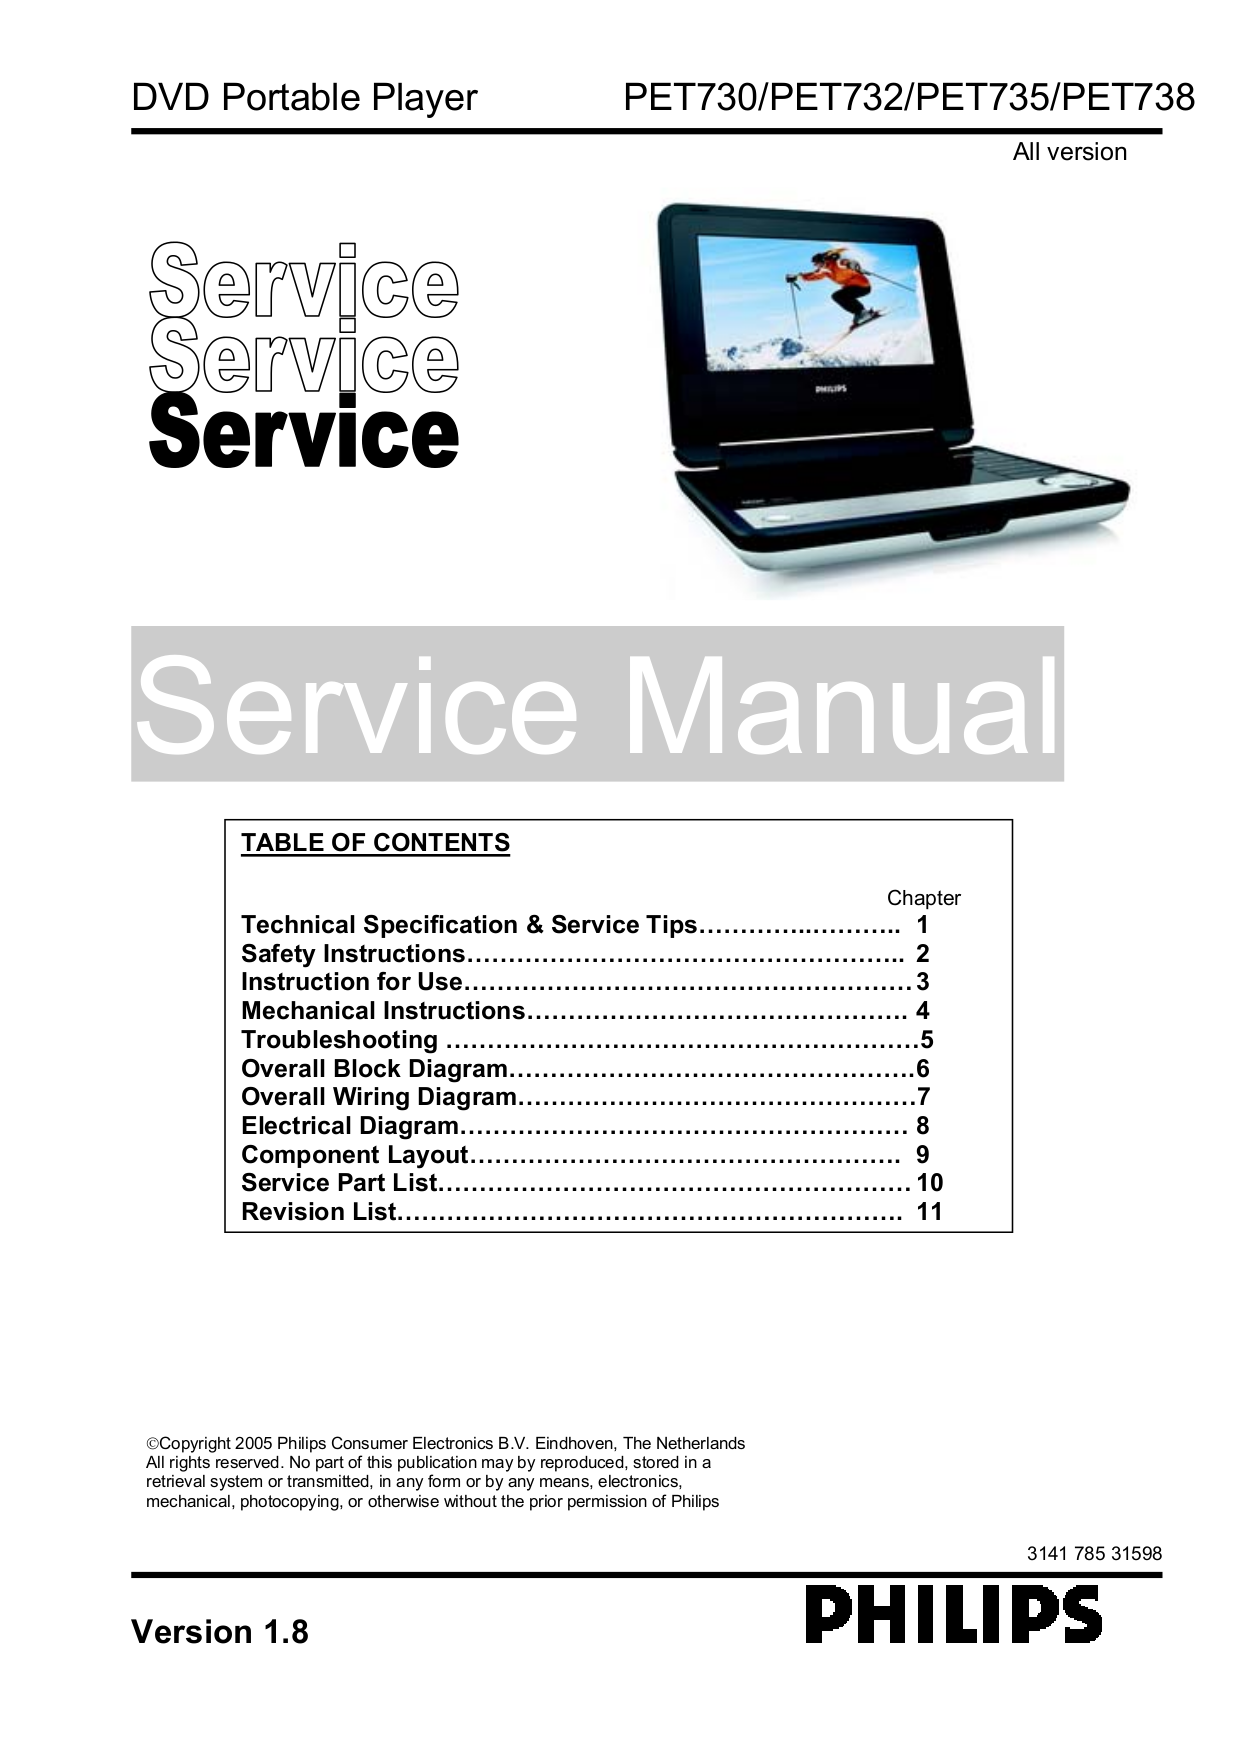 download free pdf for philips pet730 portable dvd player manual rh umlib com Philips DVD Player Manual Philips DVD Player Manual